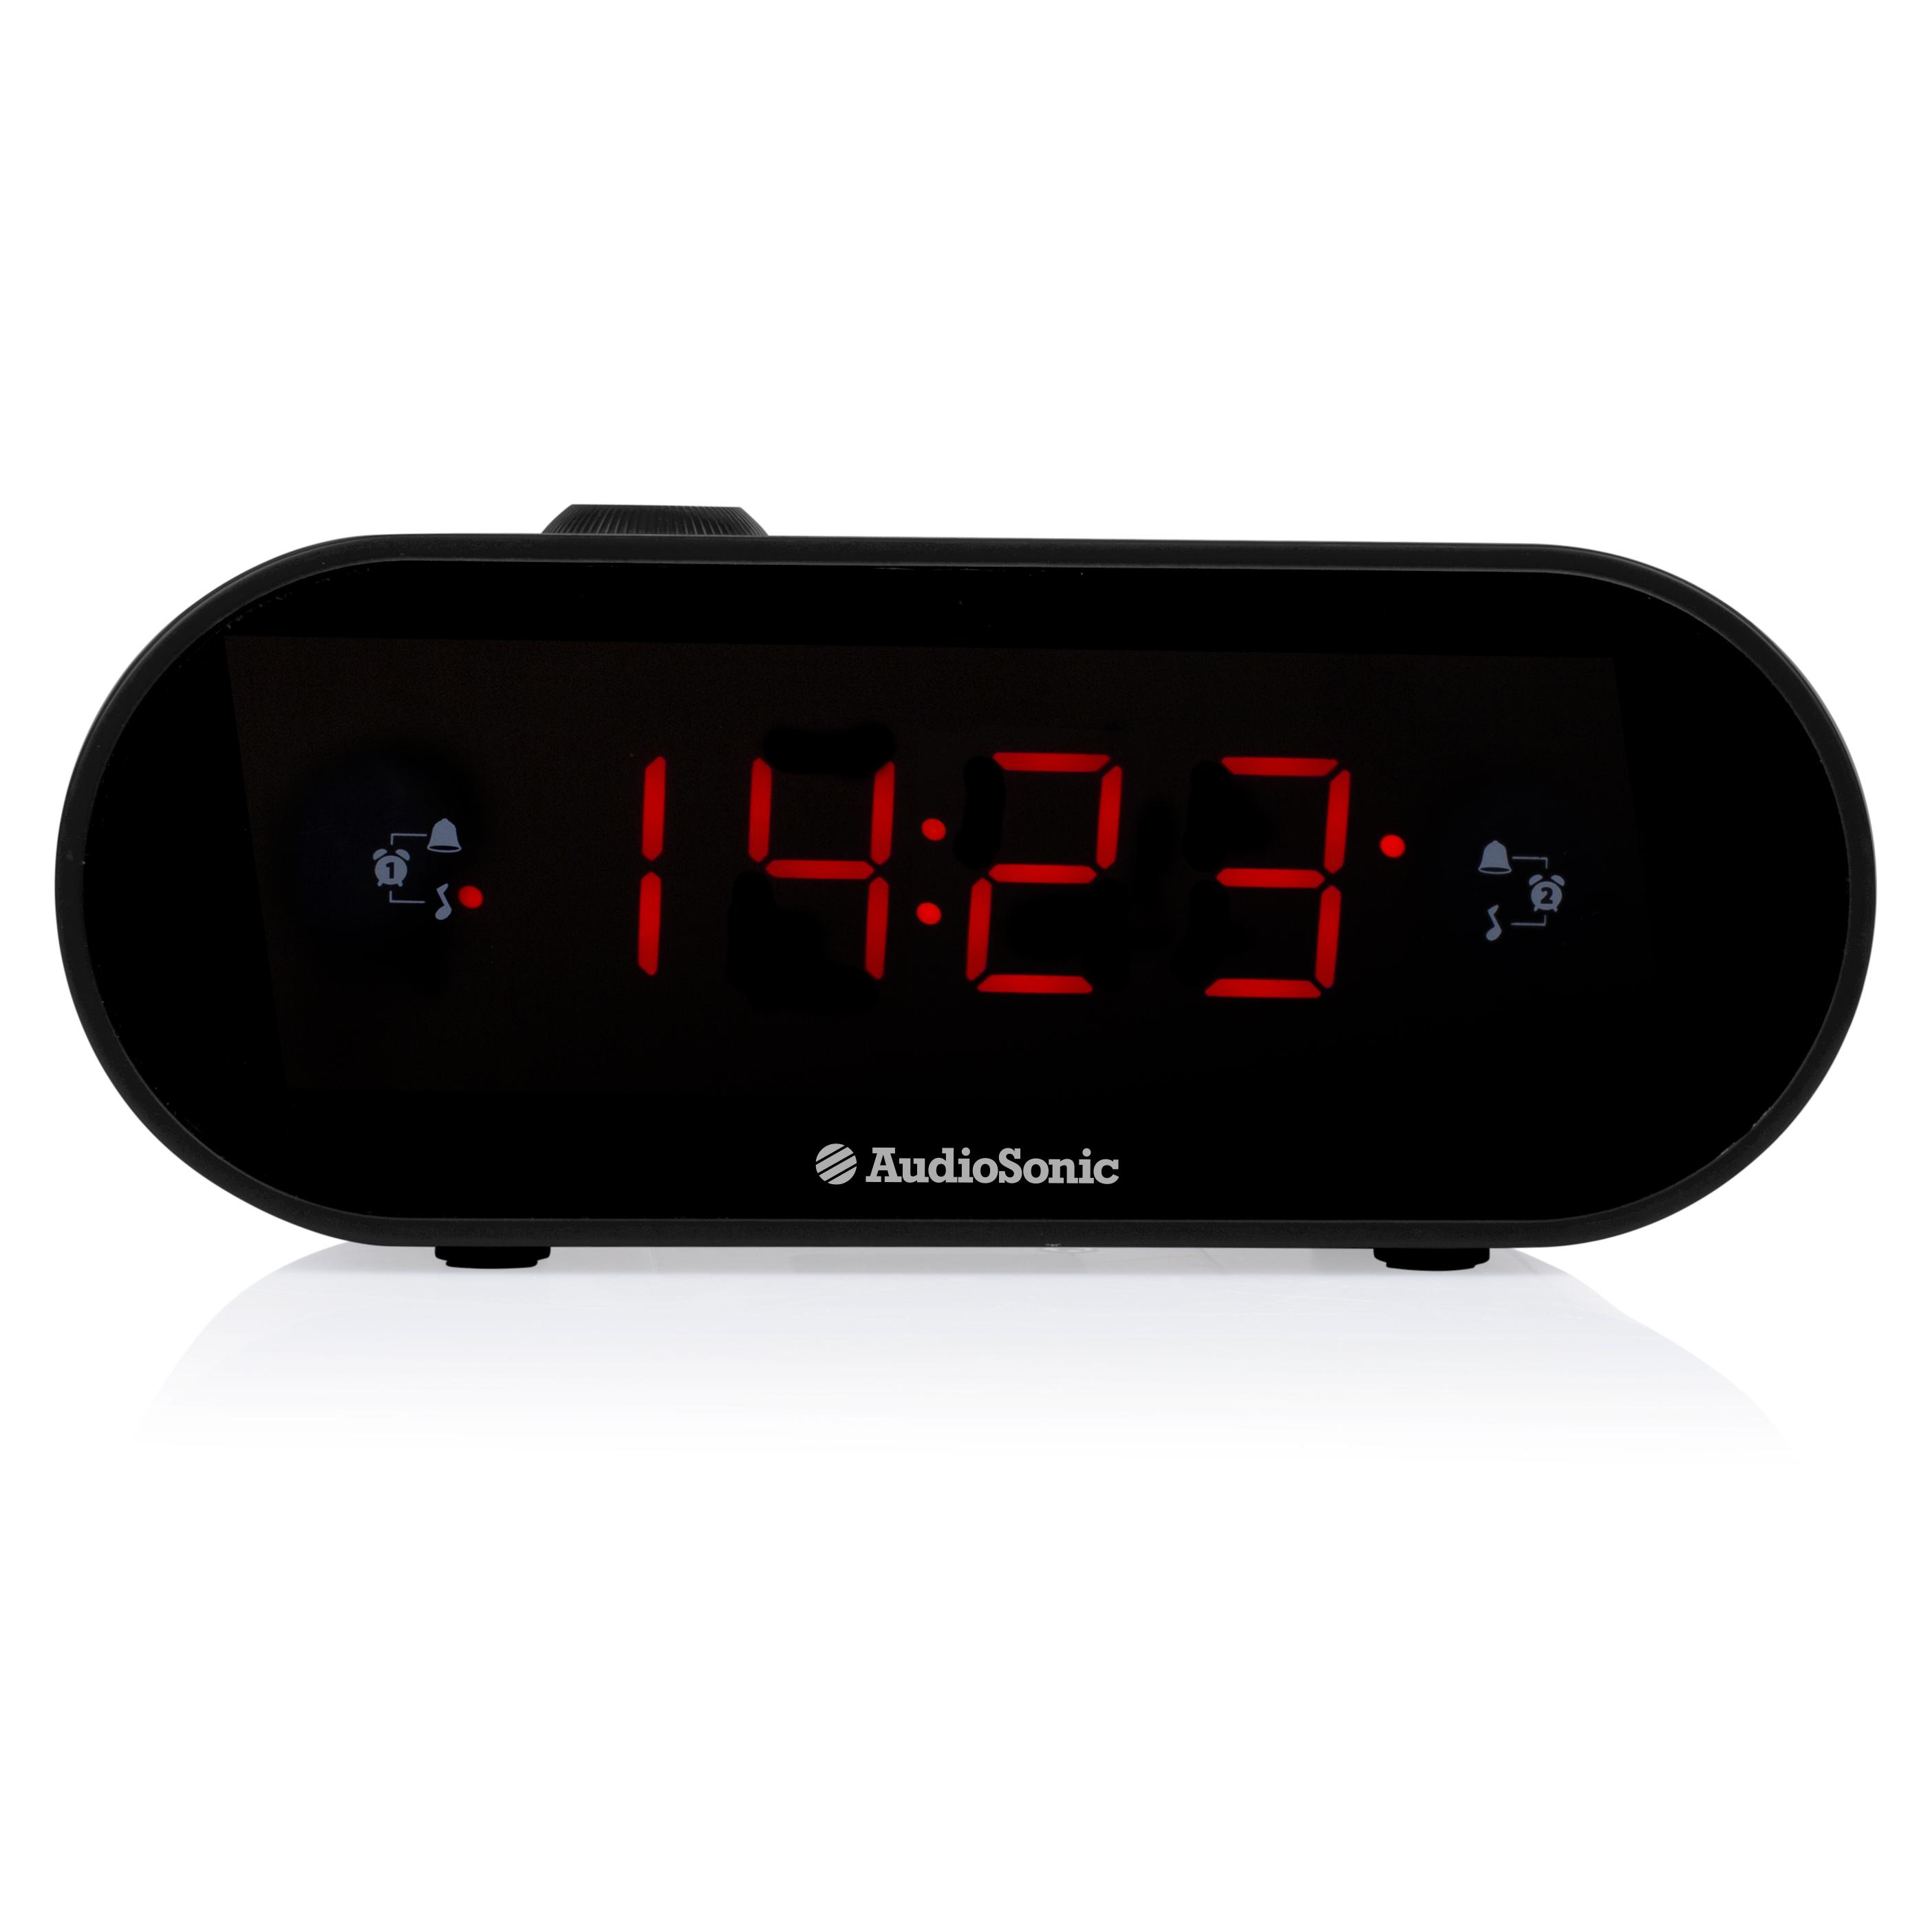 d45a3da7b40 Specs AudioSonic CL-1496 Clock radio Radios (CL-1496)